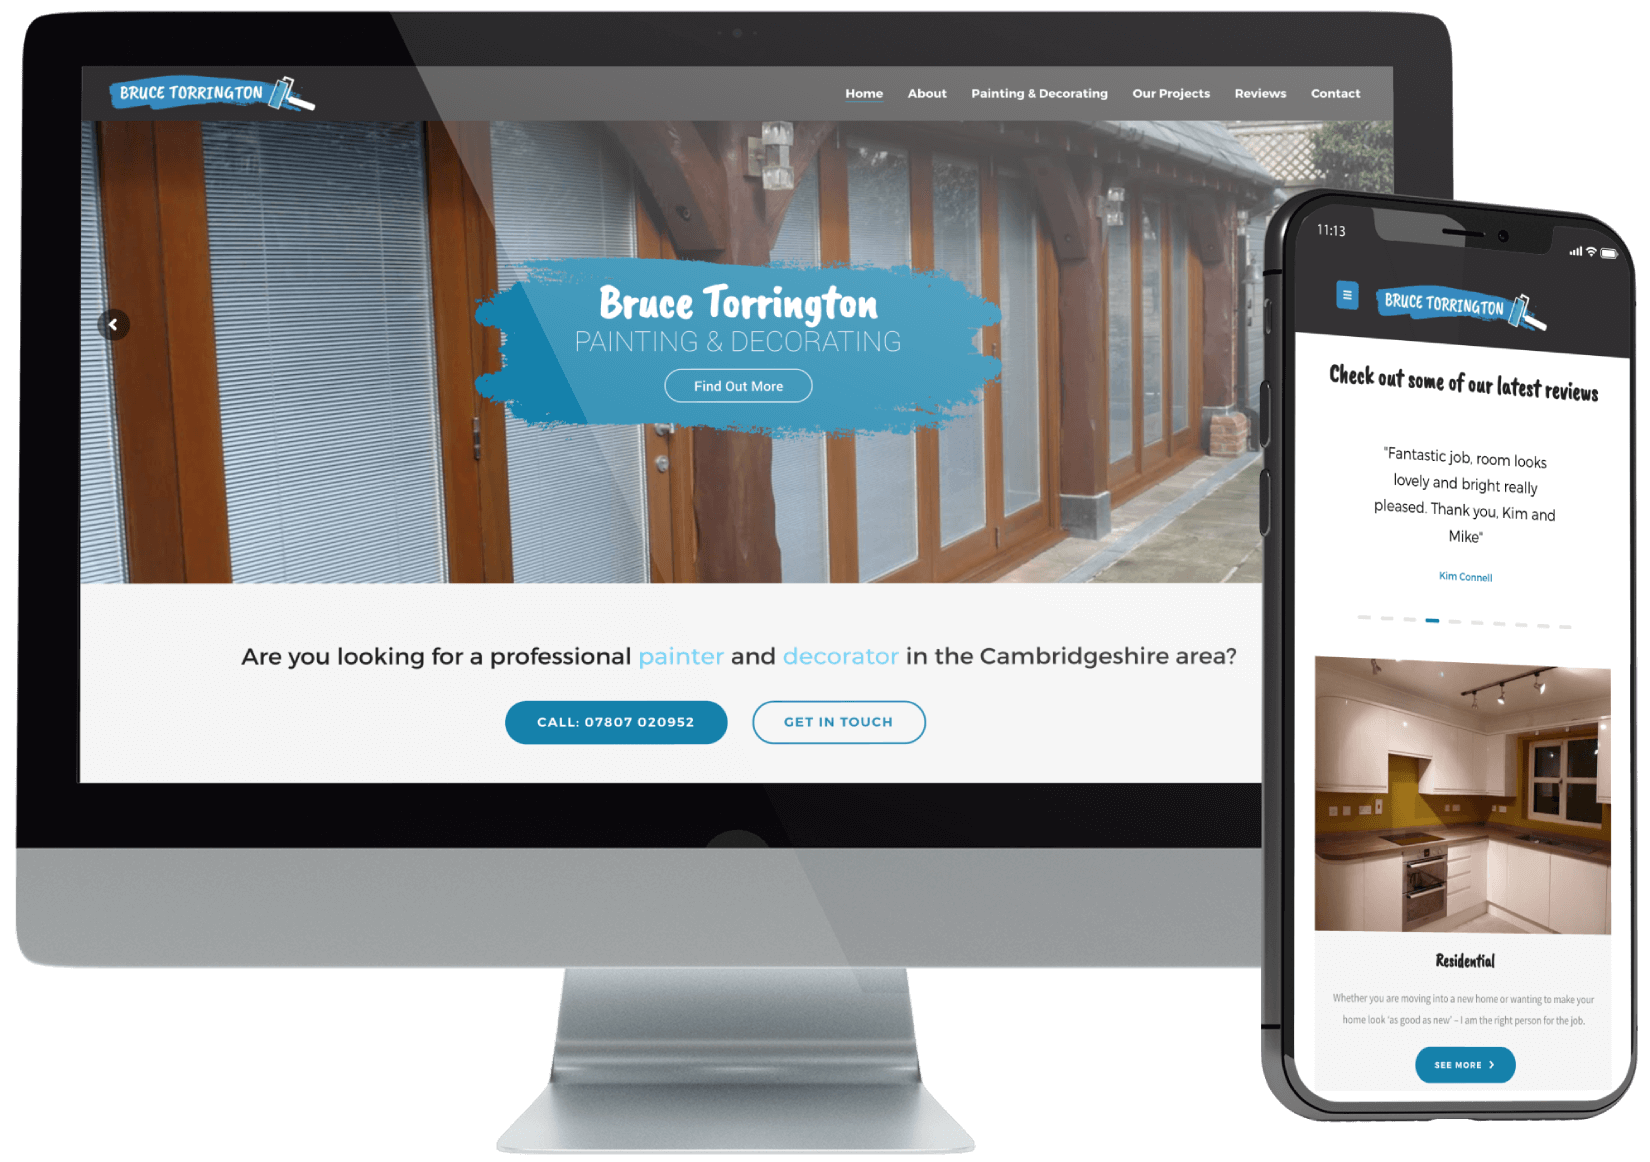 Bruce Torrington Website Design